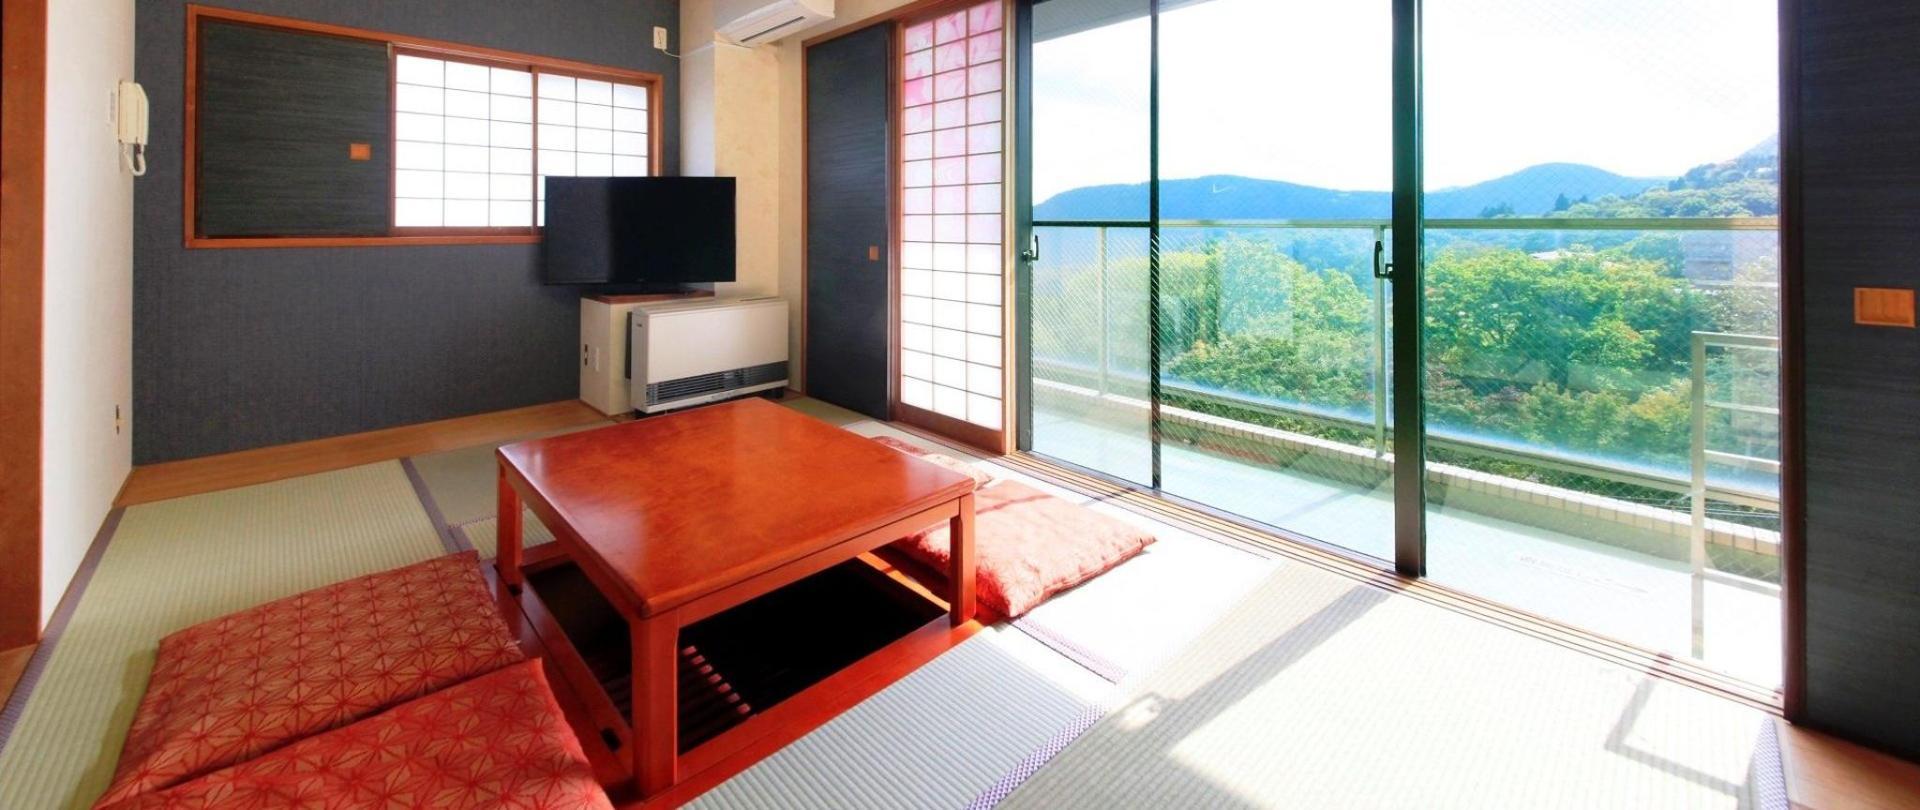 room_b.jpg